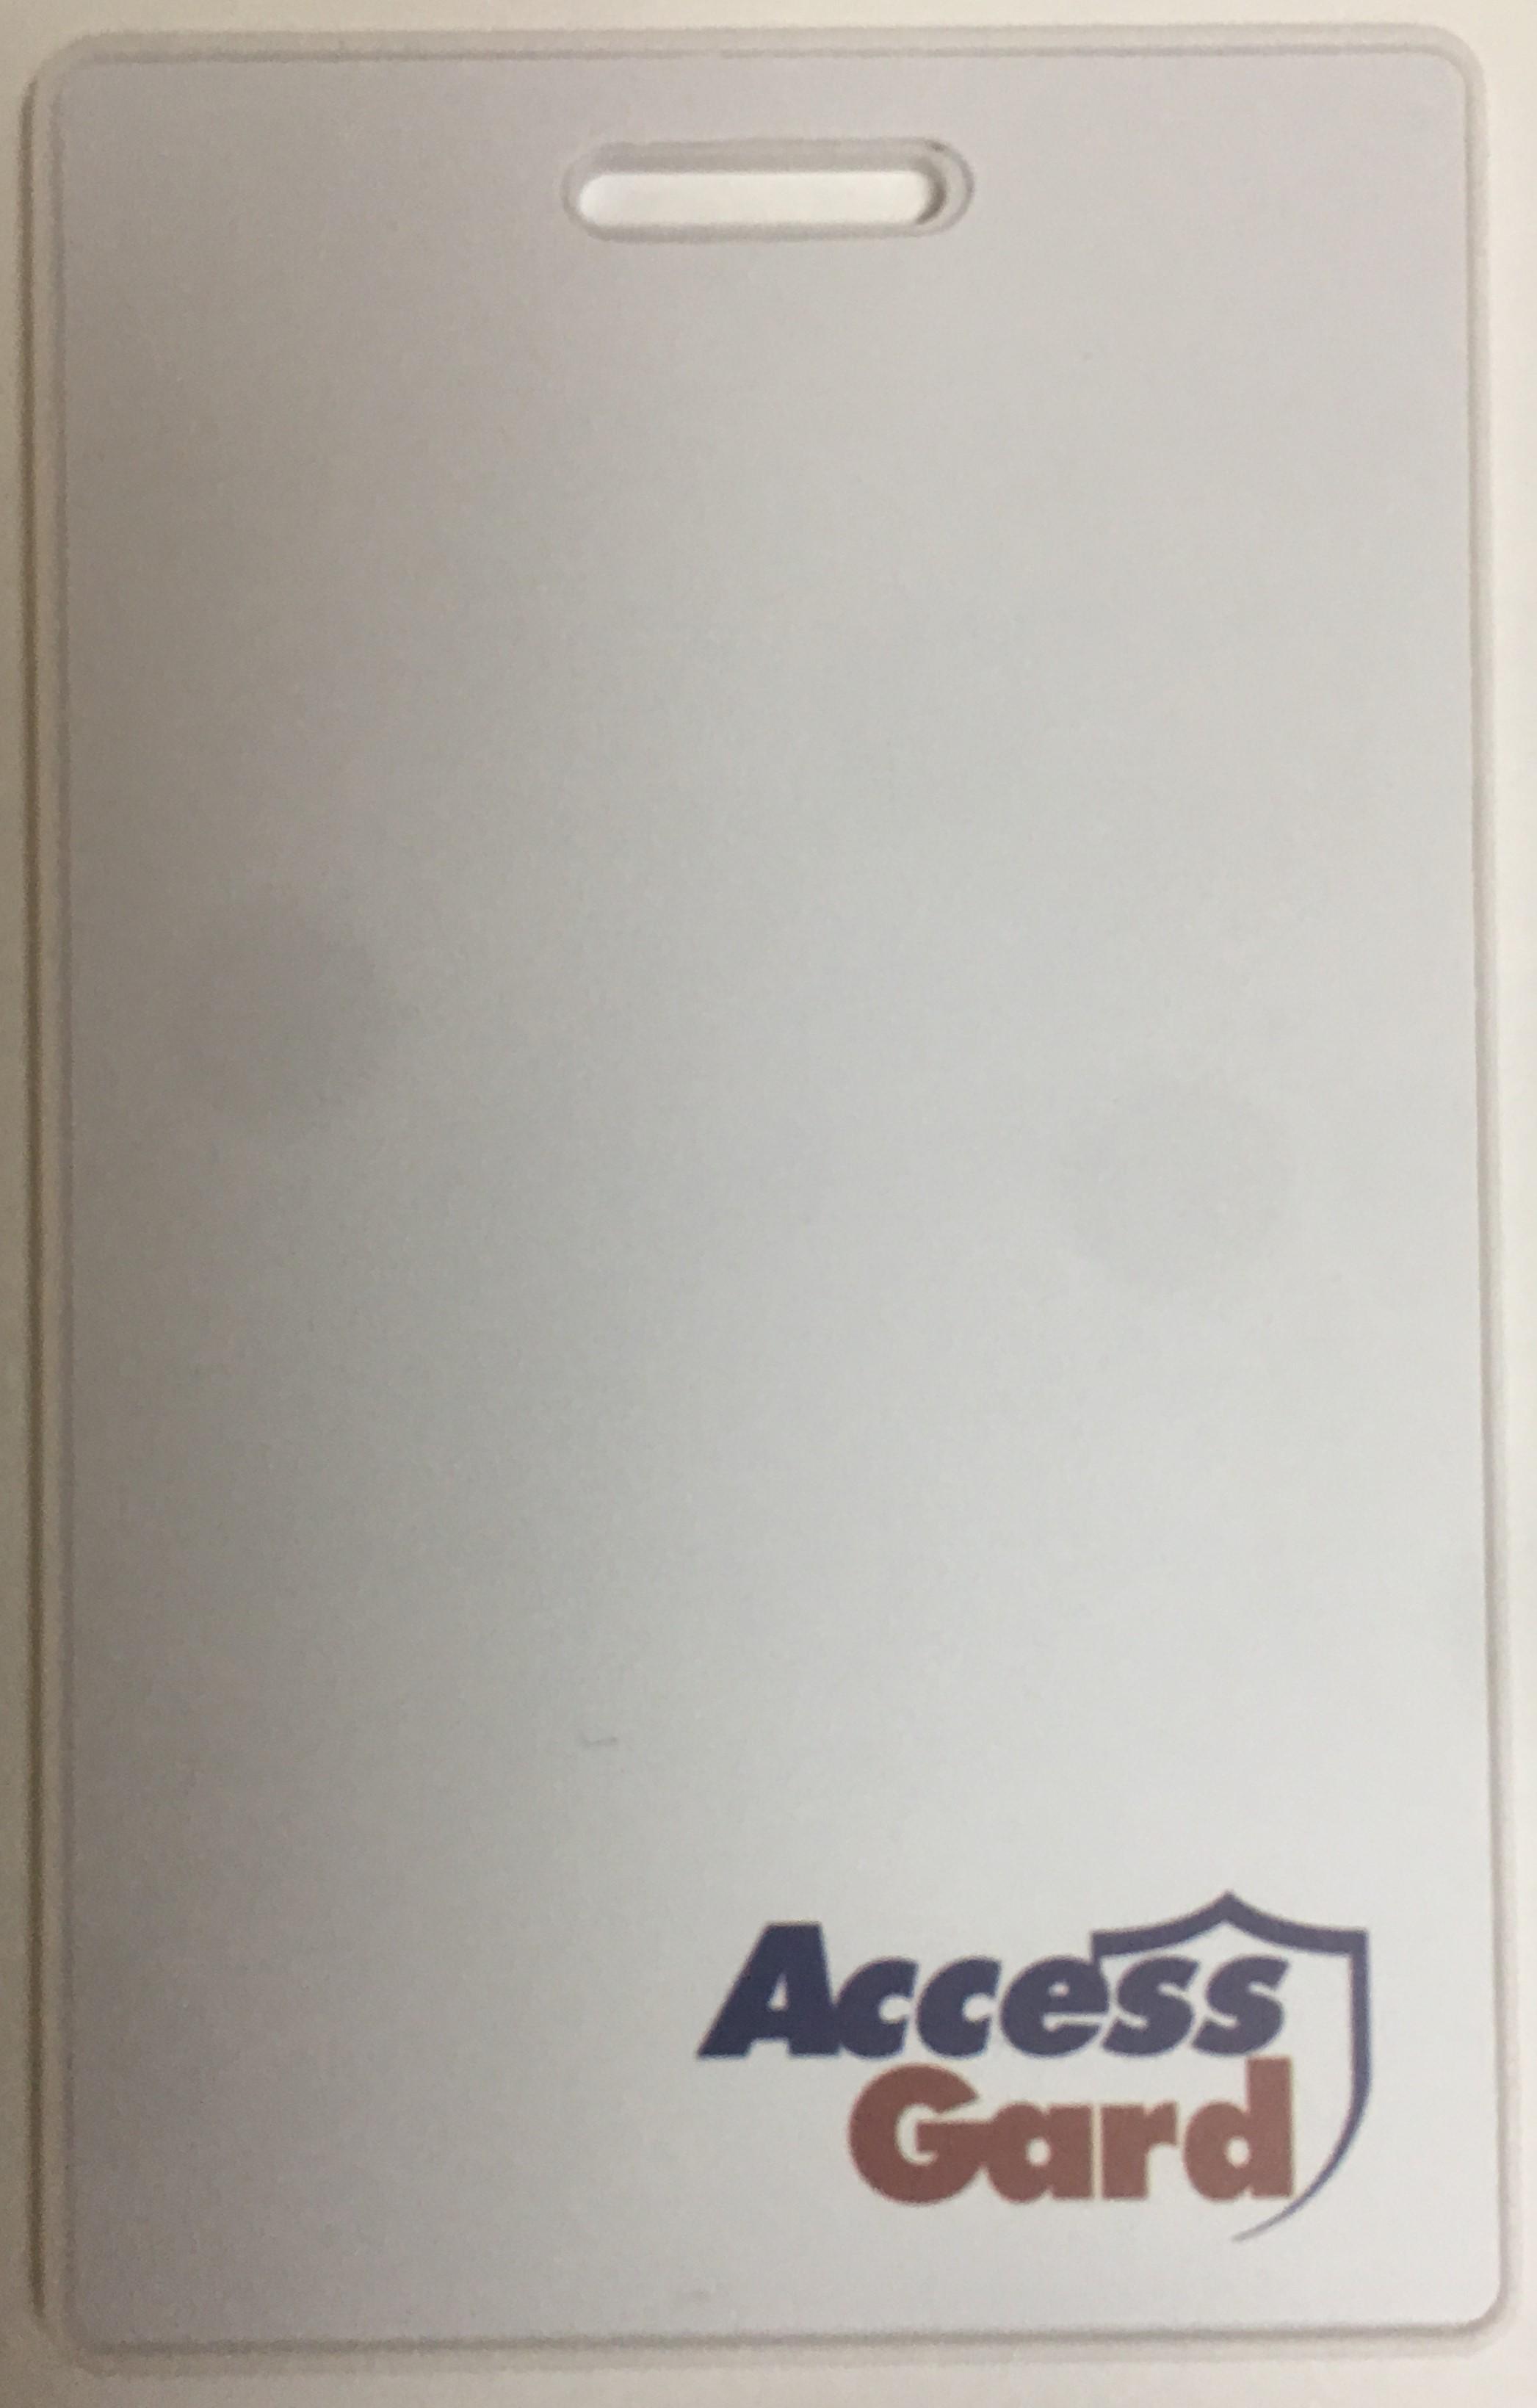 AccessGard 125kHz Clamshell Proximity Cards - HID 26-Bit - Pkg. of 25